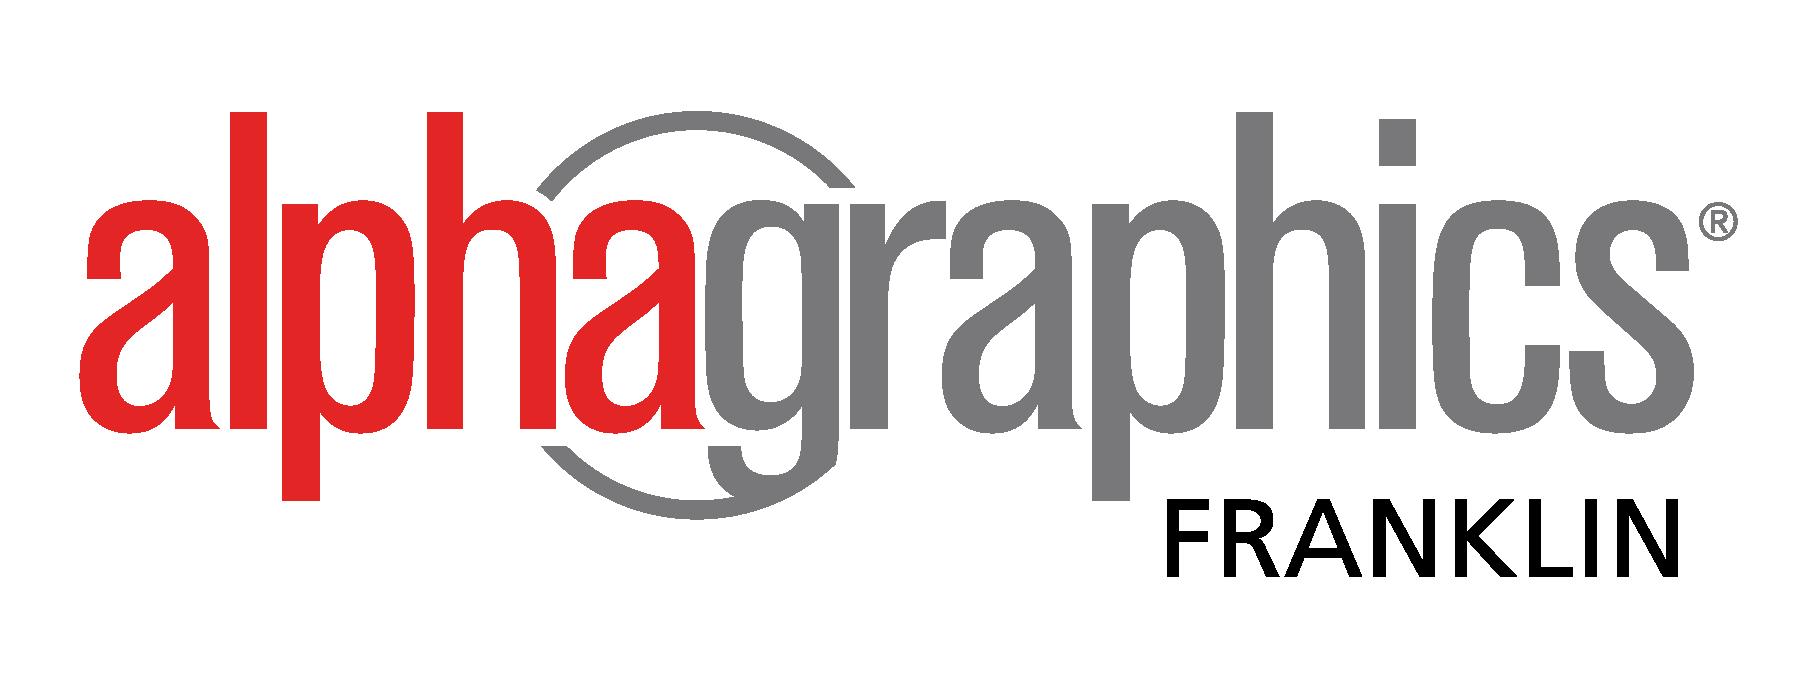 AlphaGraphics Franklin